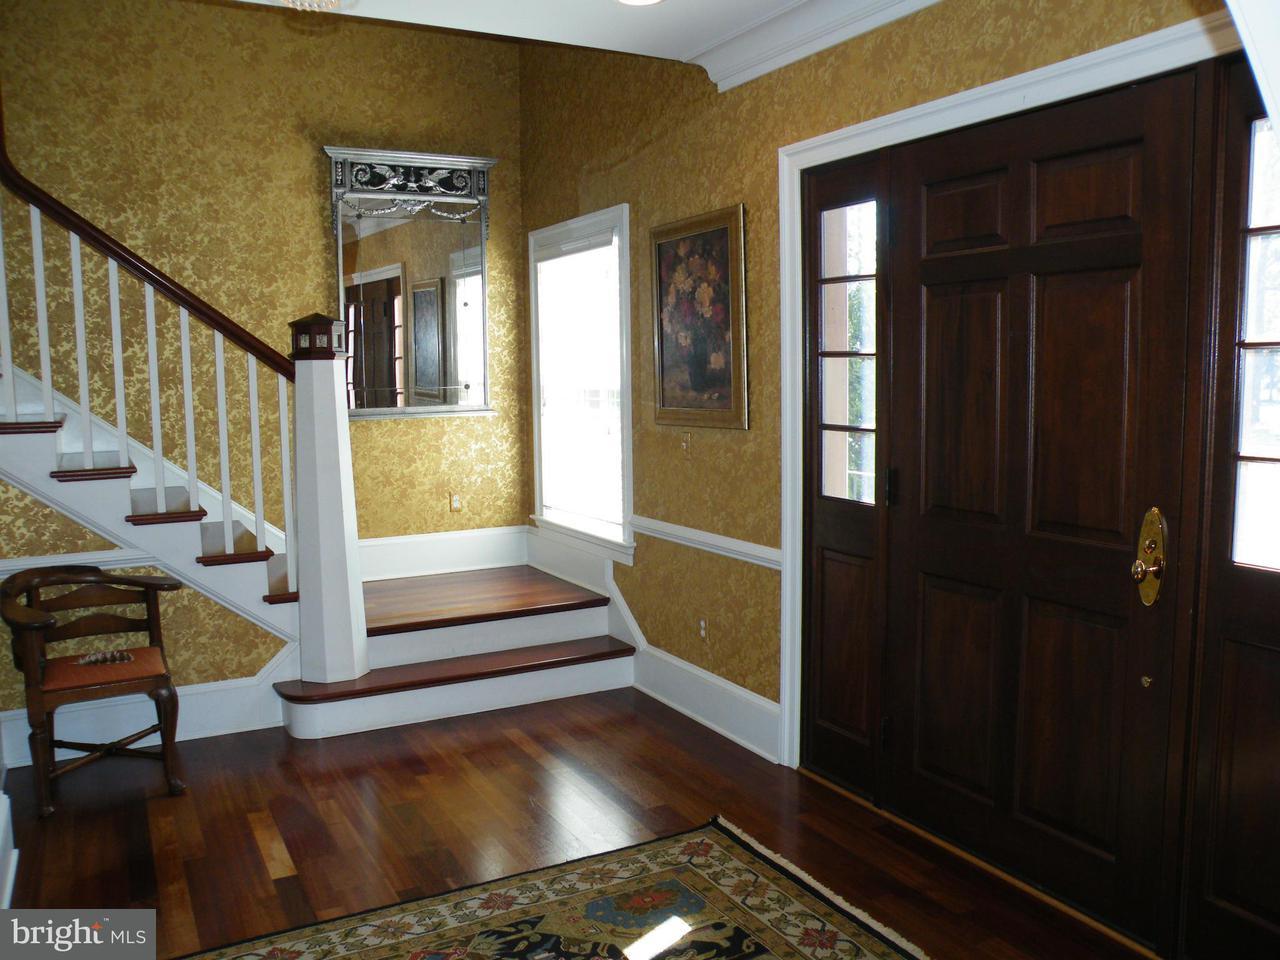 Additional photo for property listing at 26040 Goose Neck Road 26040 Goose Neck Road Royal Oak, Maryland 21662 United States